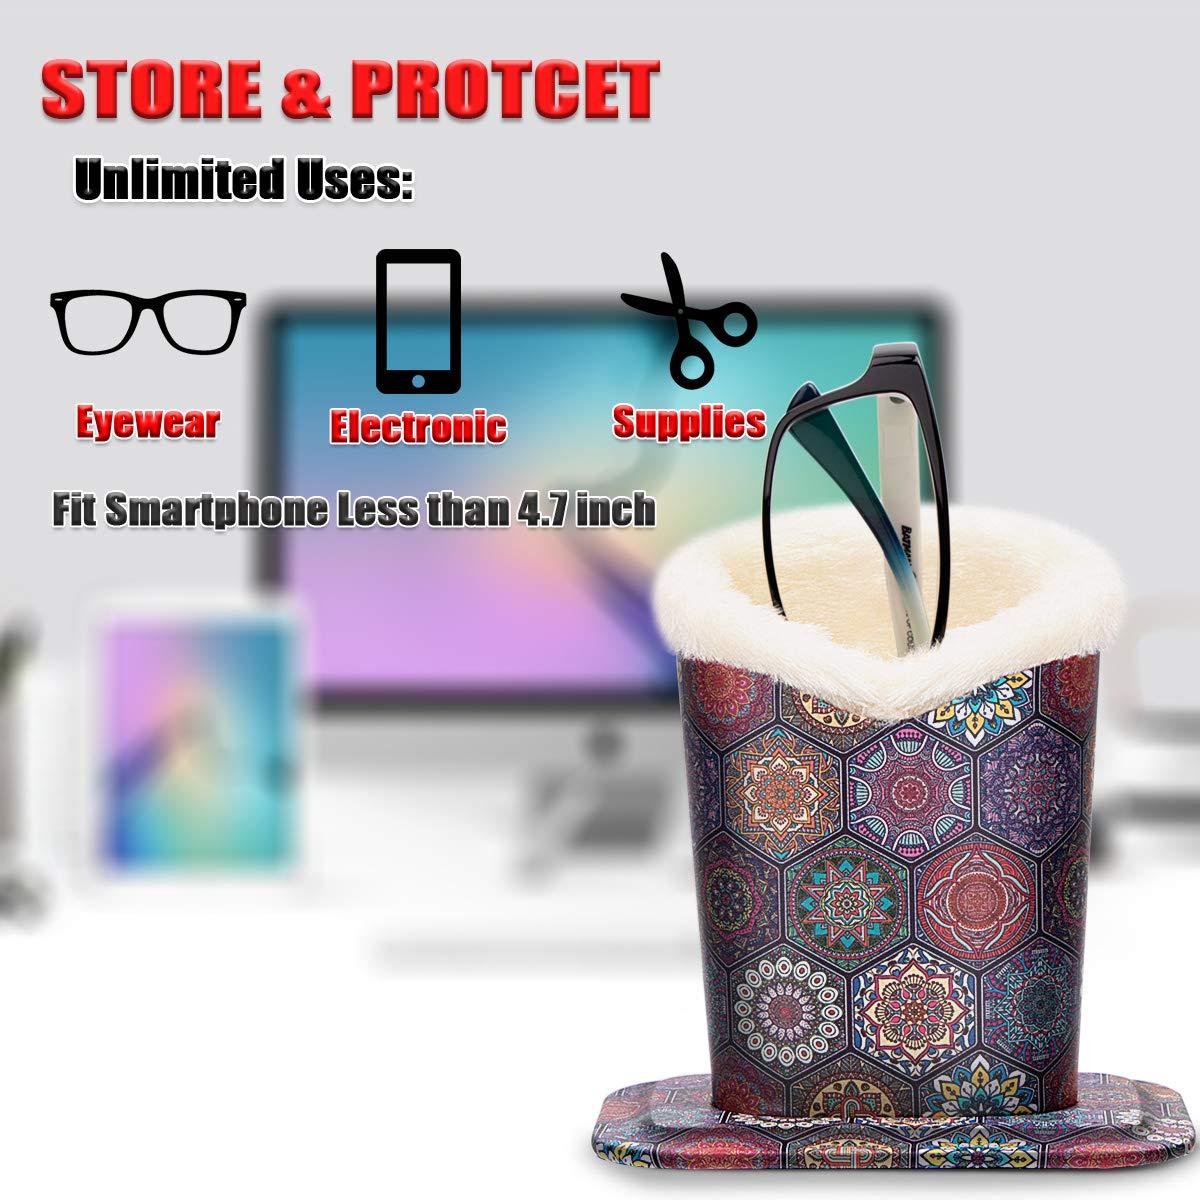 xhorizon Plush Lined Eyeglasses Holder Stand Case Protective Glasses Case for Desks